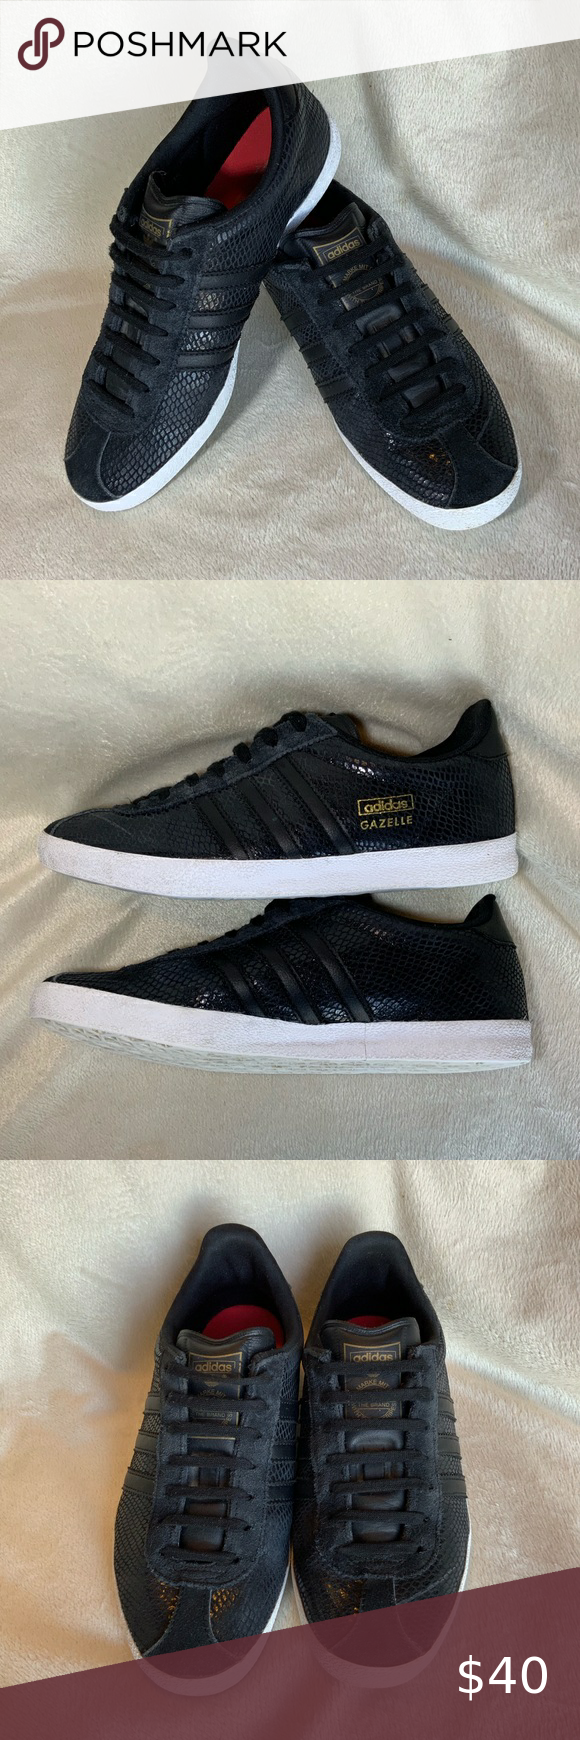 ADIDAS GAZELLE Black Snake Skin Print Shoes | Adidas gazelle black ...